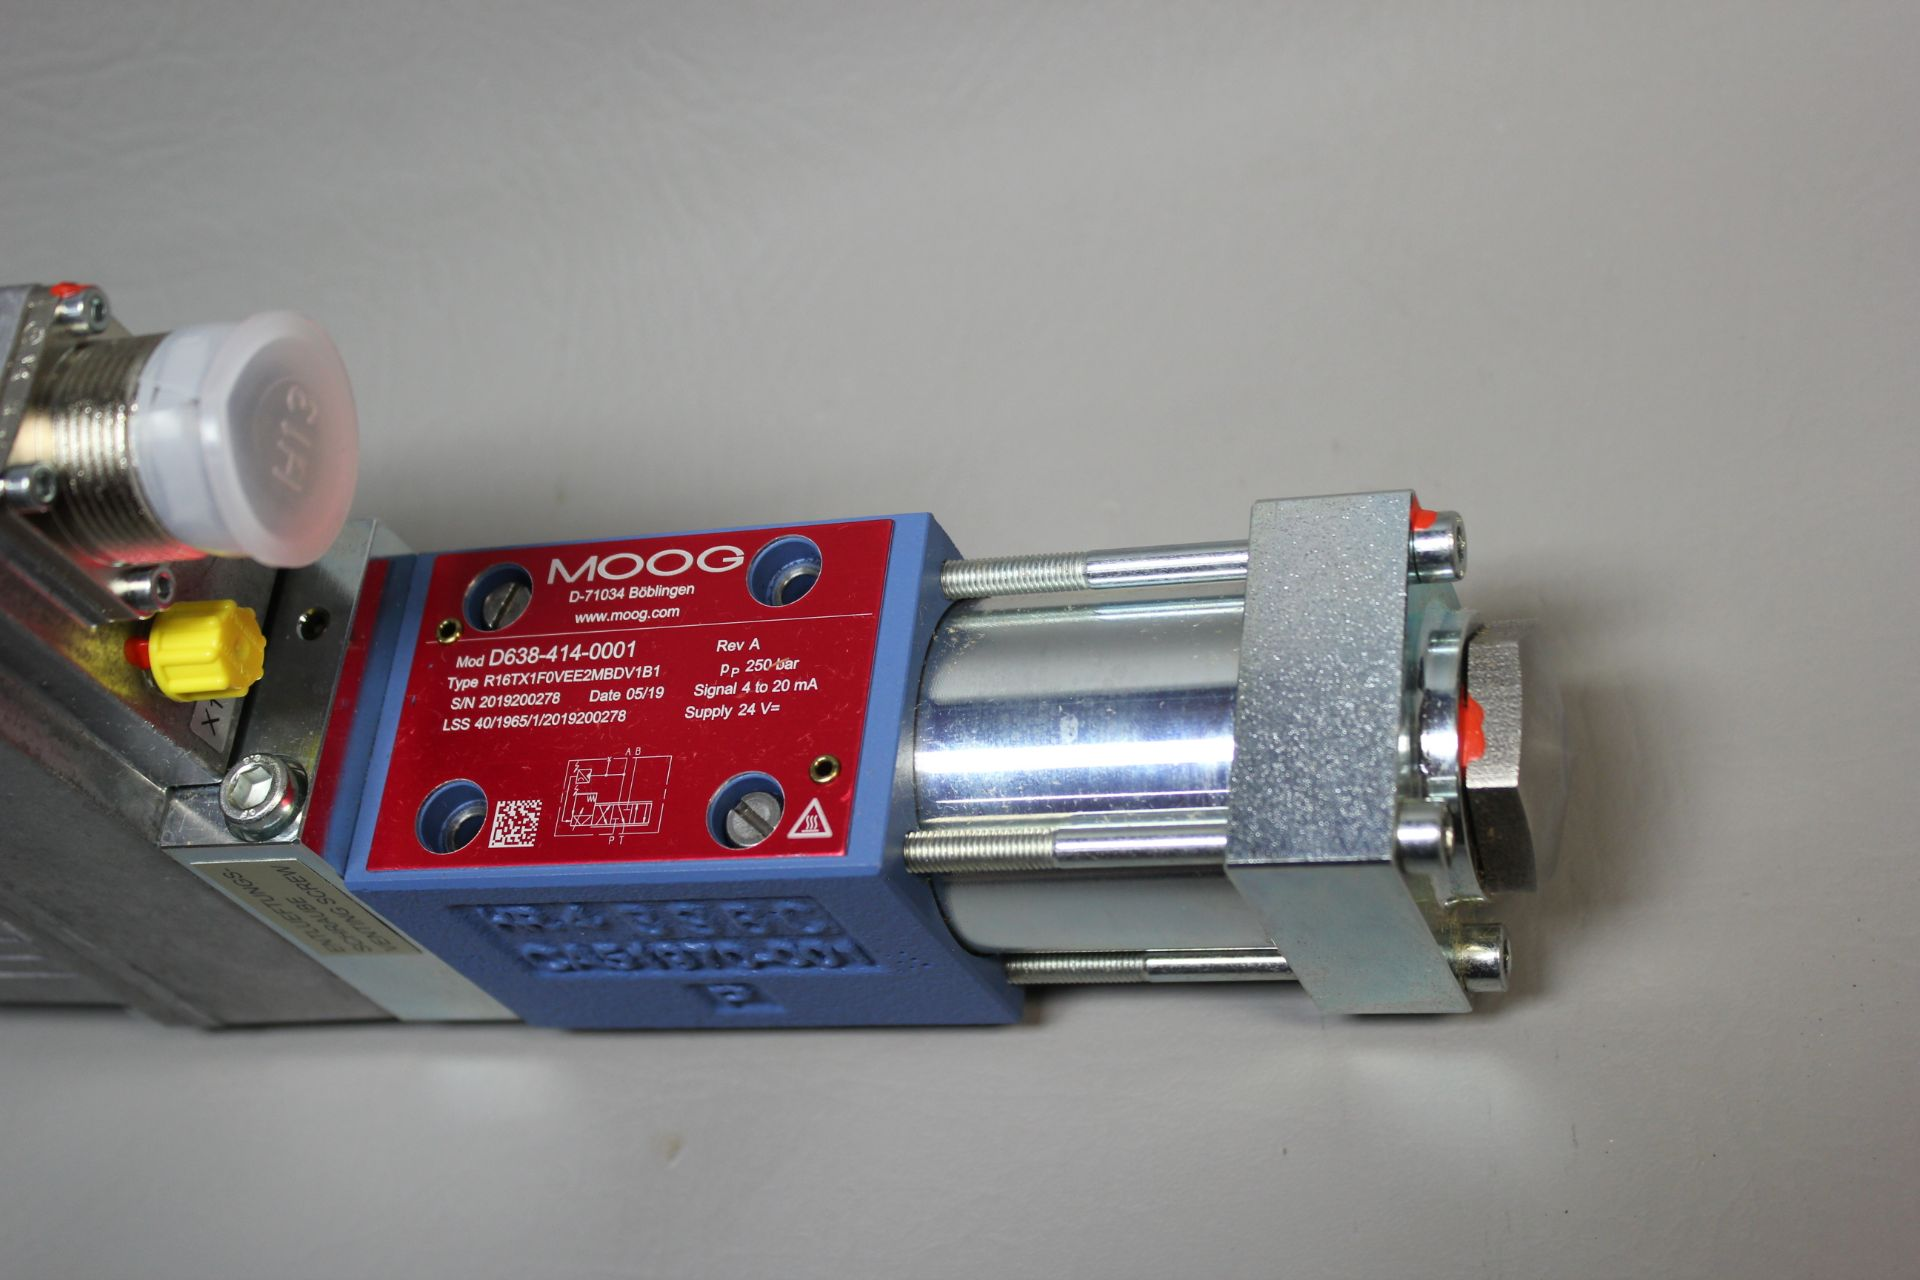 NEW MOOG DIRECT DRIVE DIGITAL CONTROL HYDRAULIC SERVO VALVE - Image 8 of 12